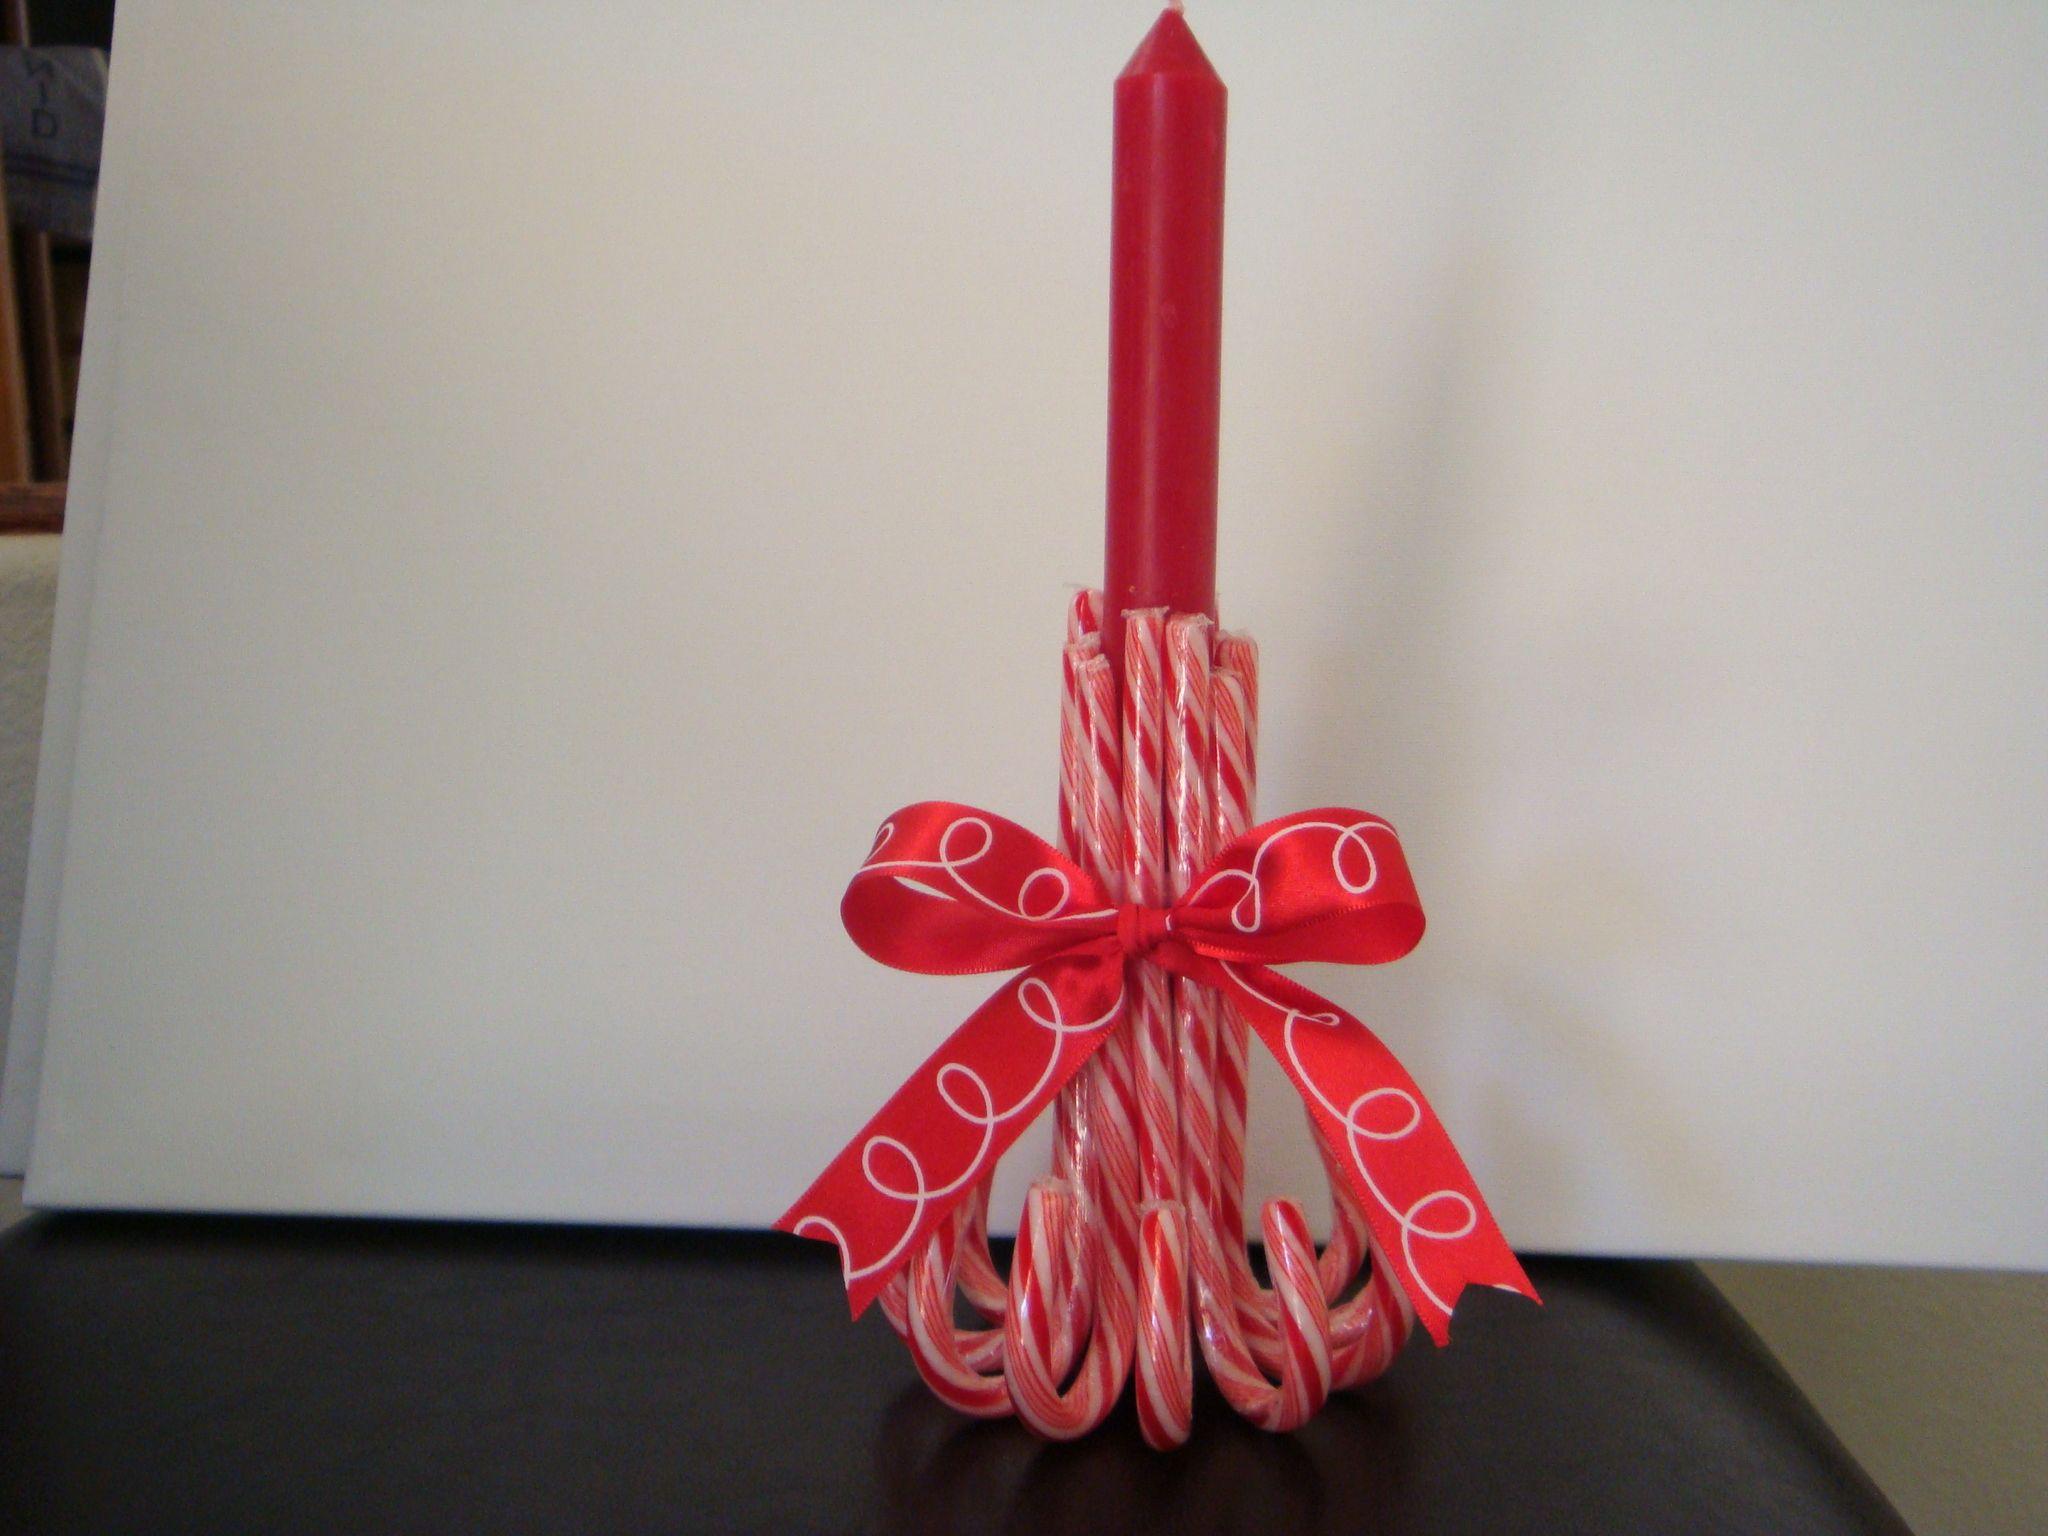 Candy cane candle holder crafts pinterest for Candle holder crafts